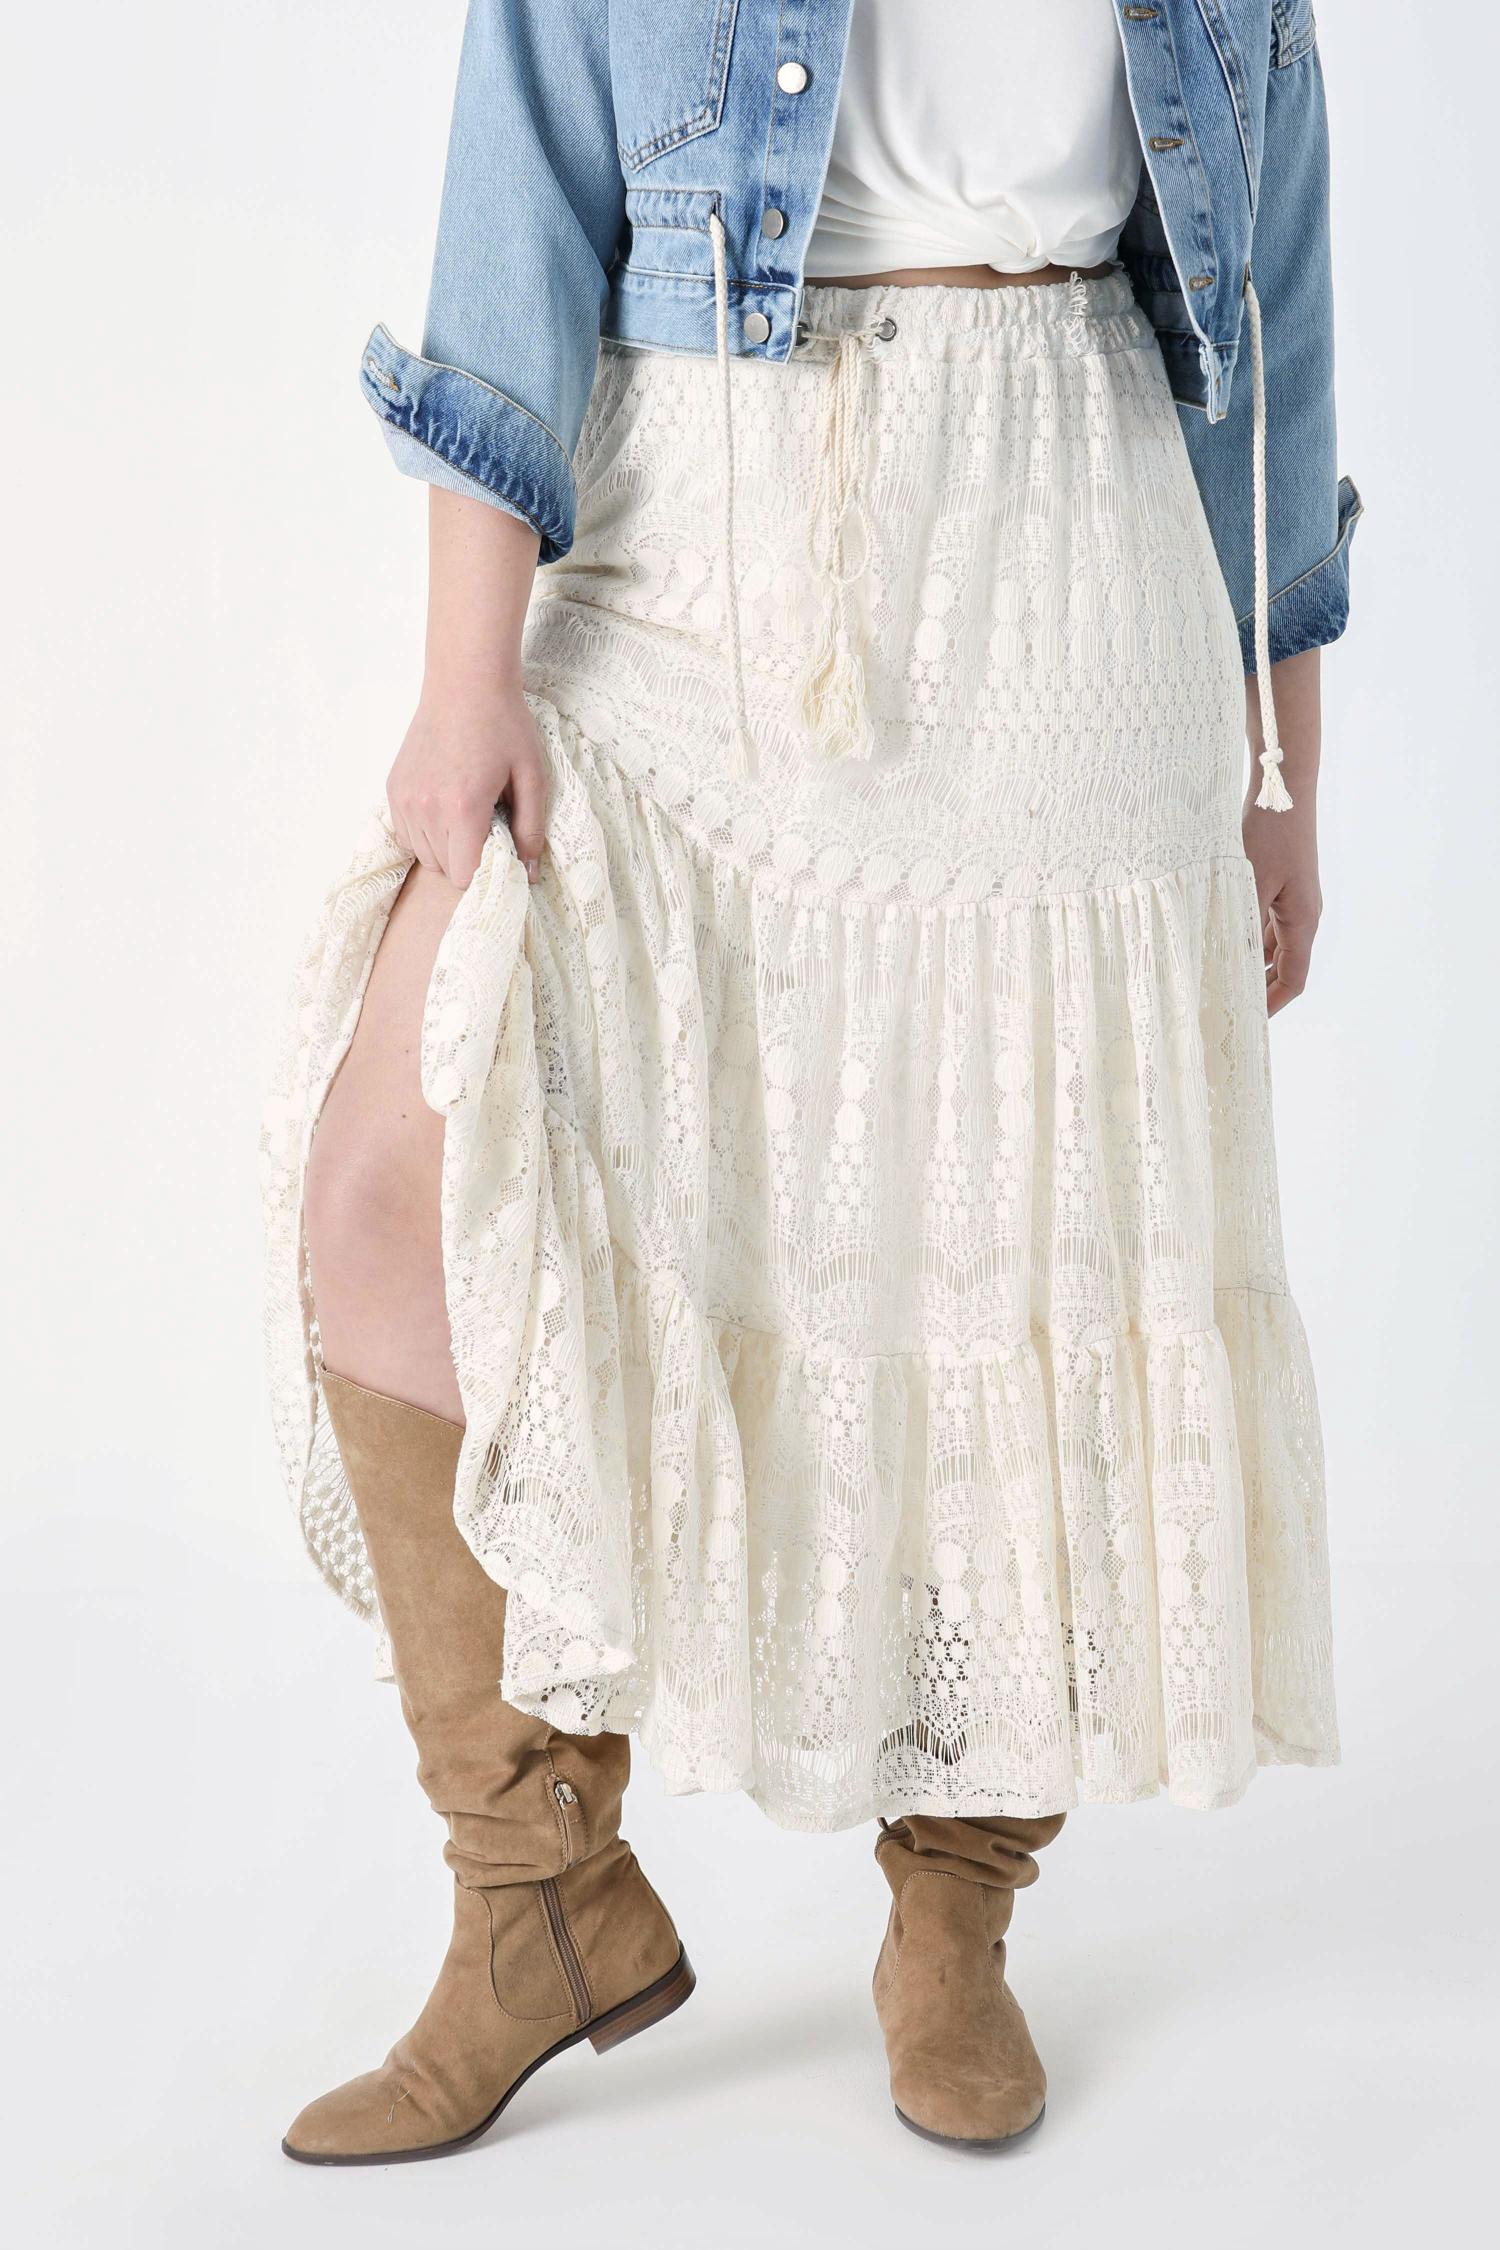 Ruffled lace skirt (shipping April 15/20)